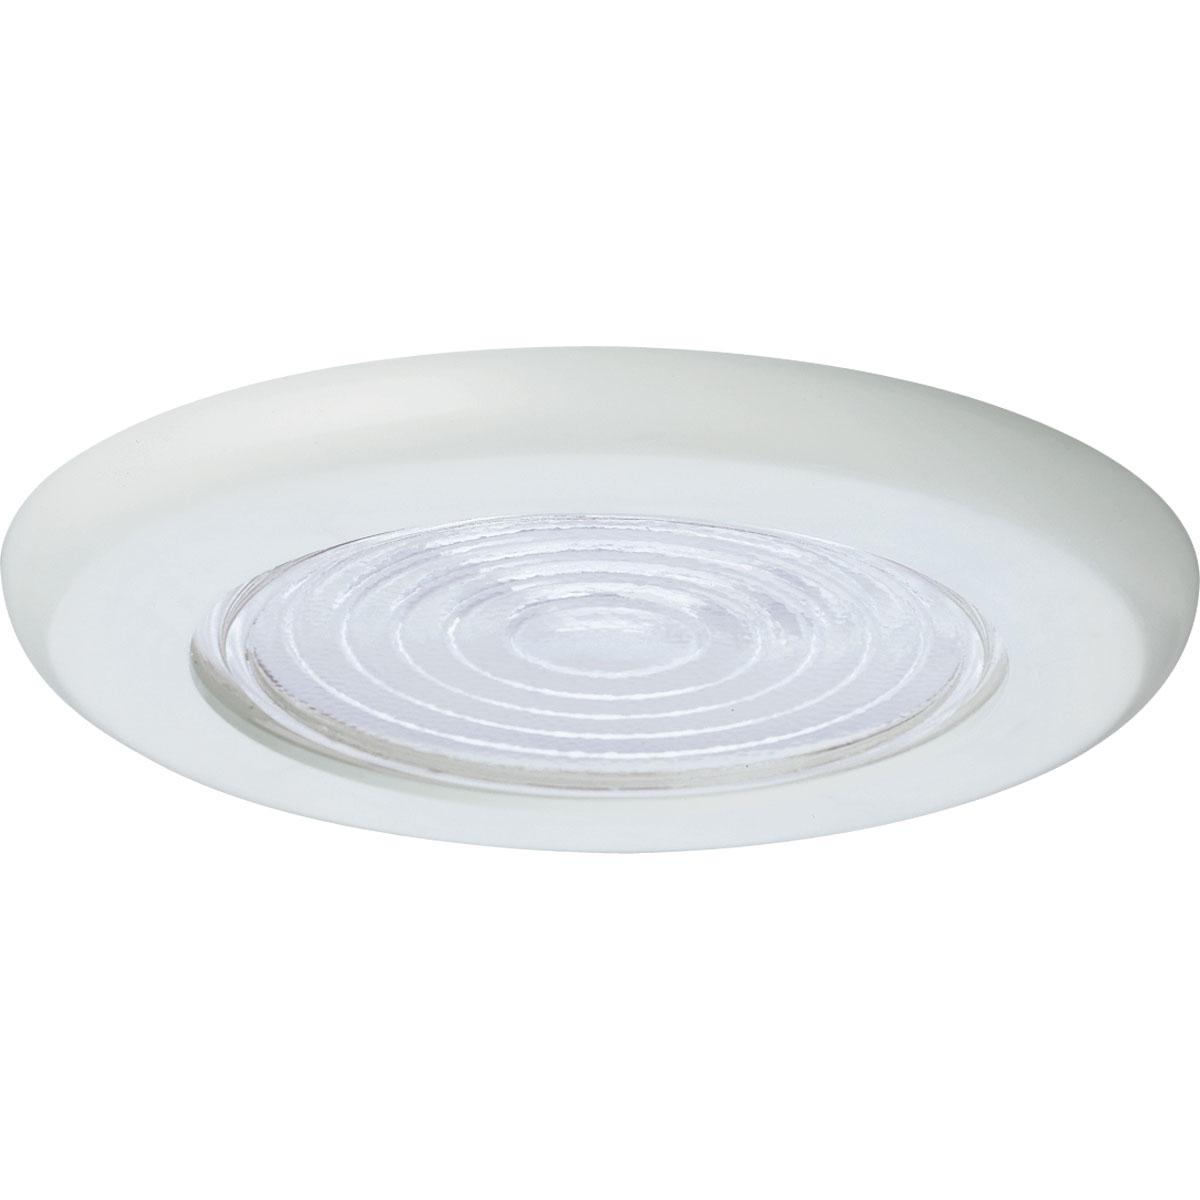 PRO P8011-60 White Recessed Lighting Trim 75PAR30SN